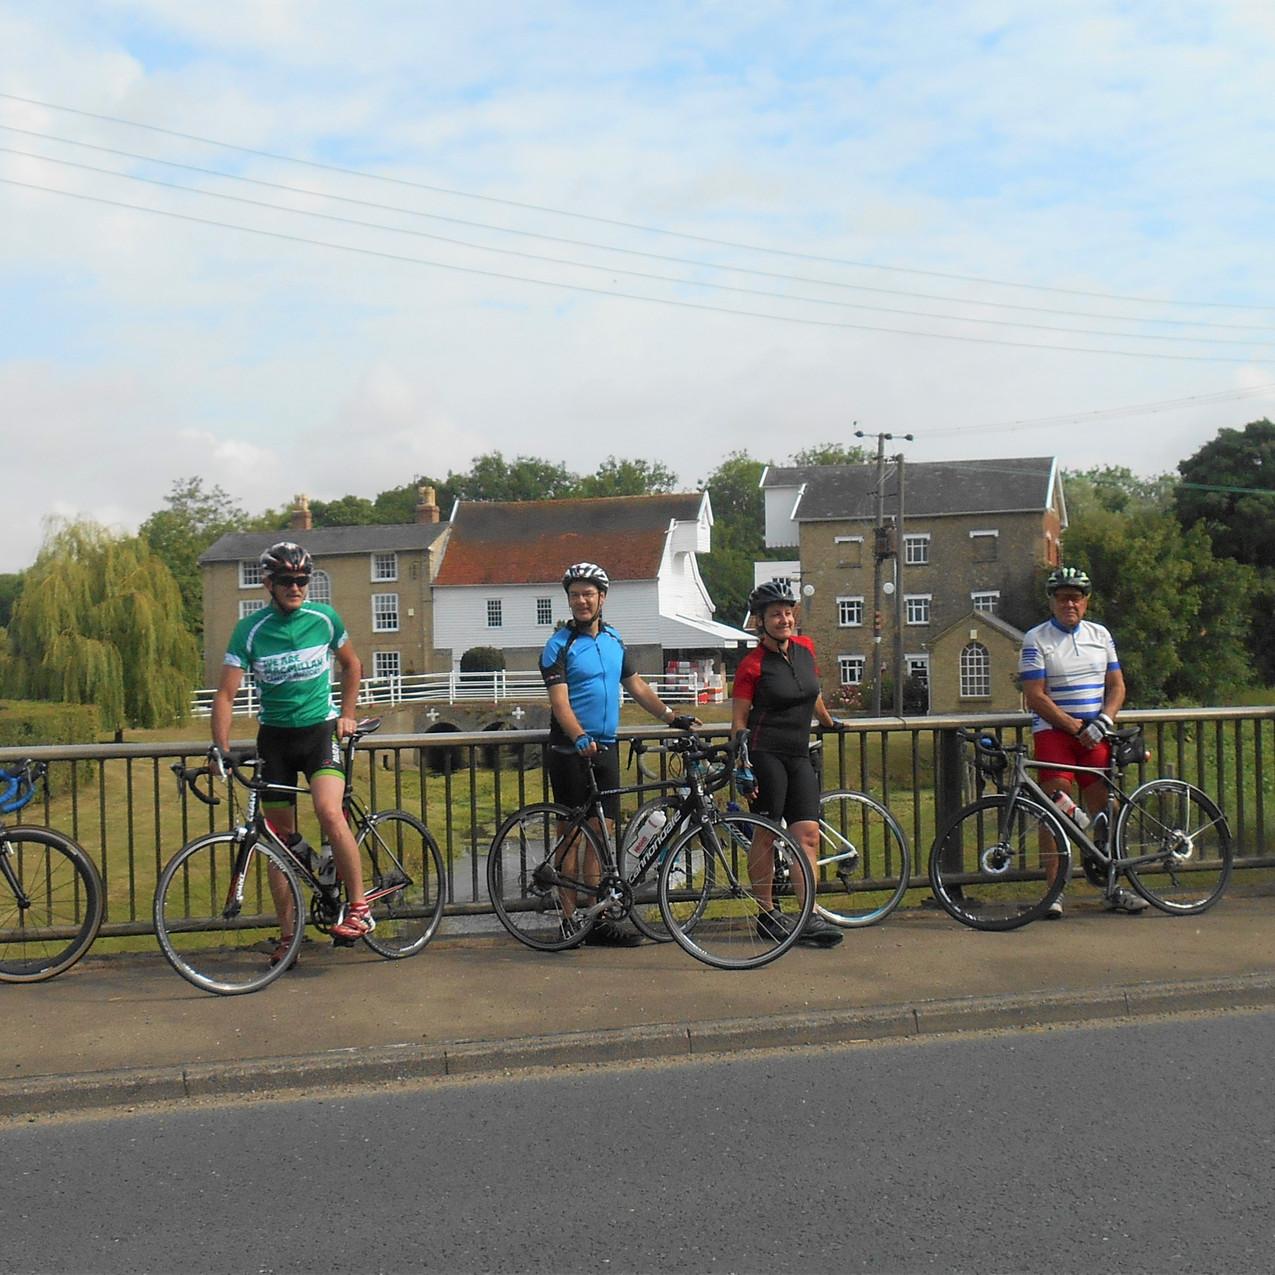 WM Cycle Sportive